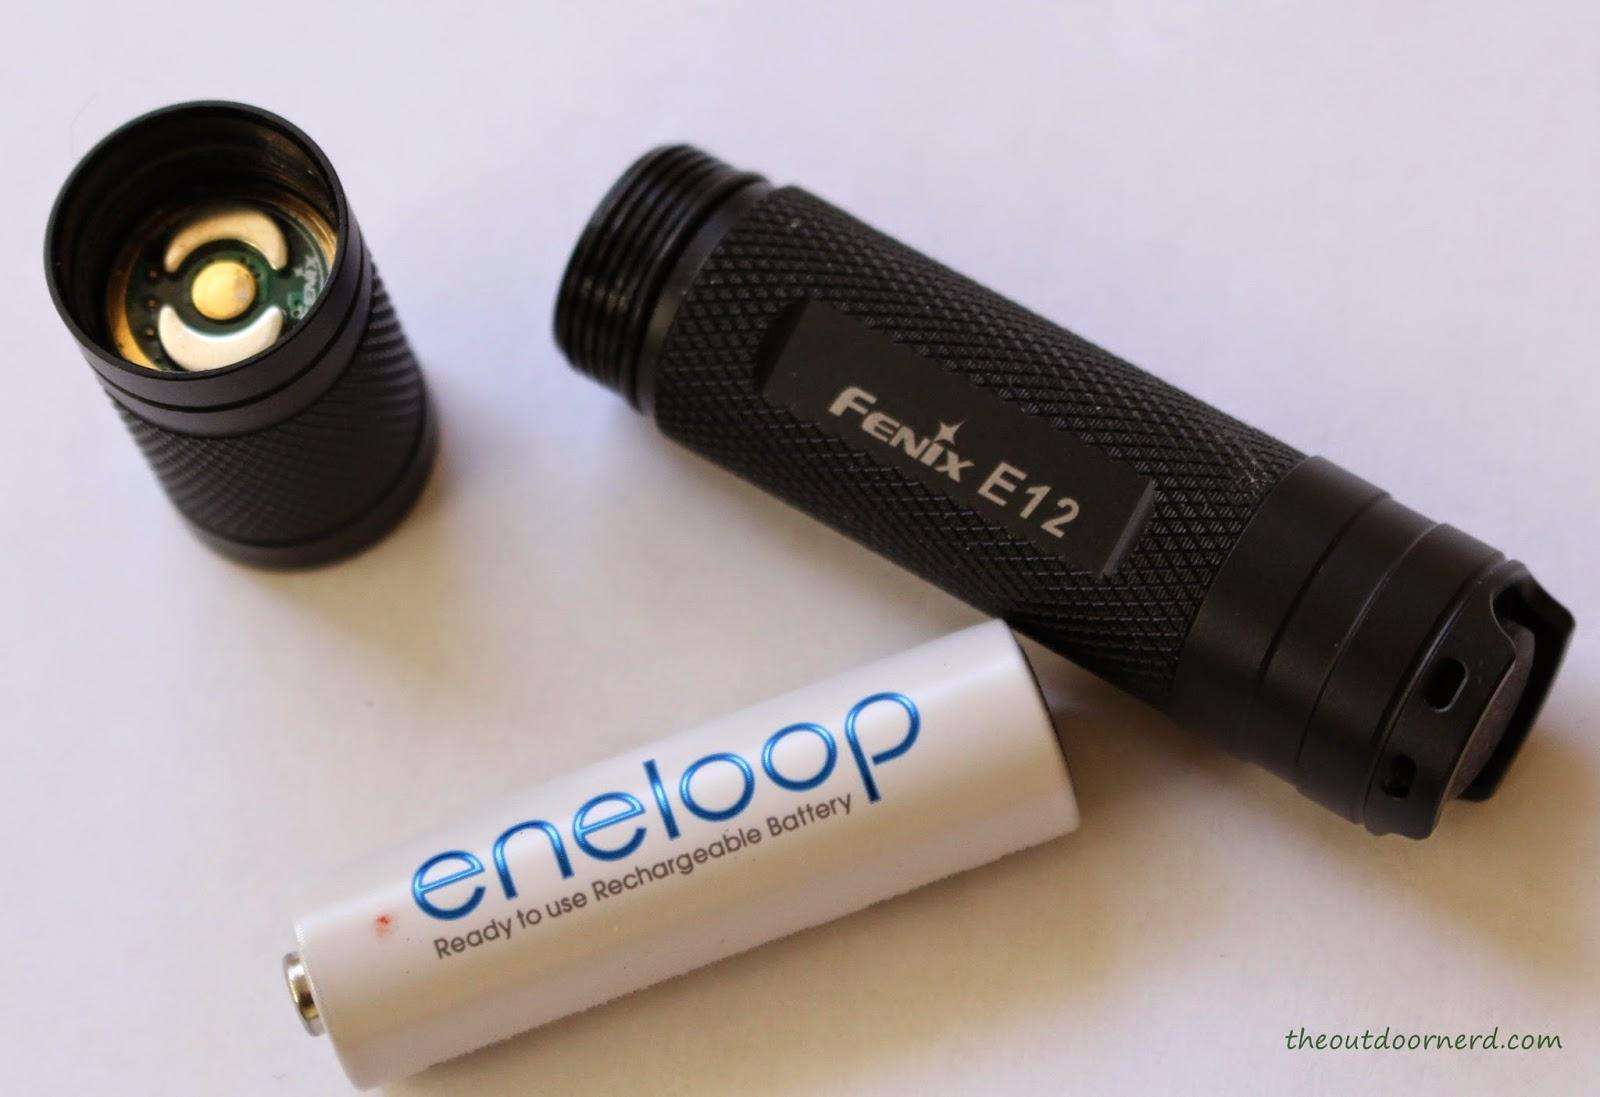 Fenix E12 1xAA EDC Flashlight Product Image 6